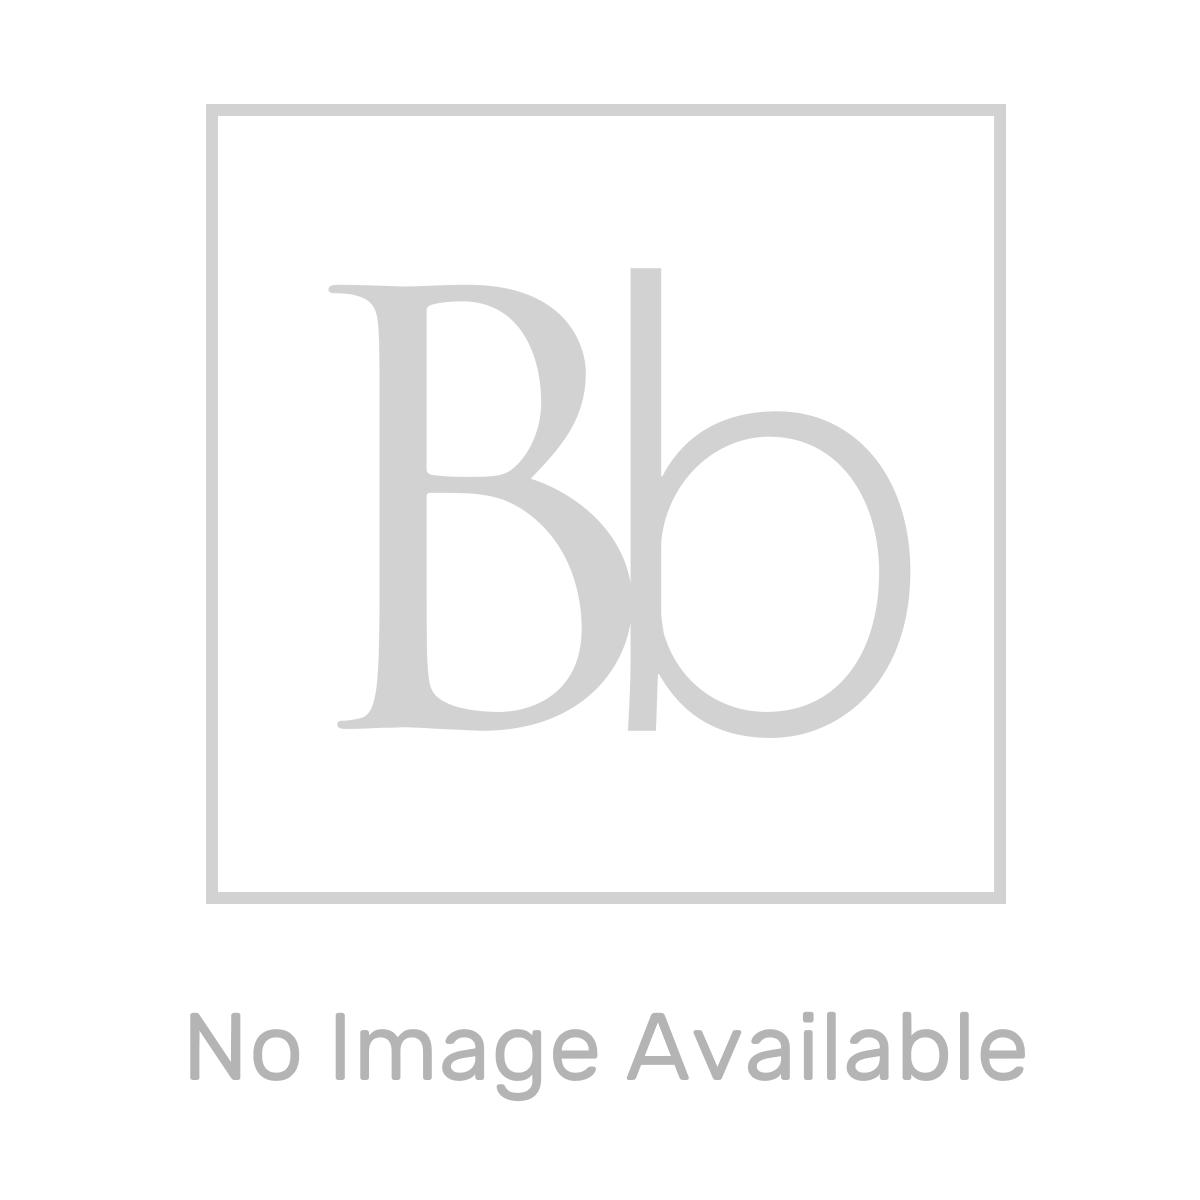 Elation Combination P Shape Indigo Matt Furniture Suite with April Destini Sliding Shower Enclosure with Cayton Toilet